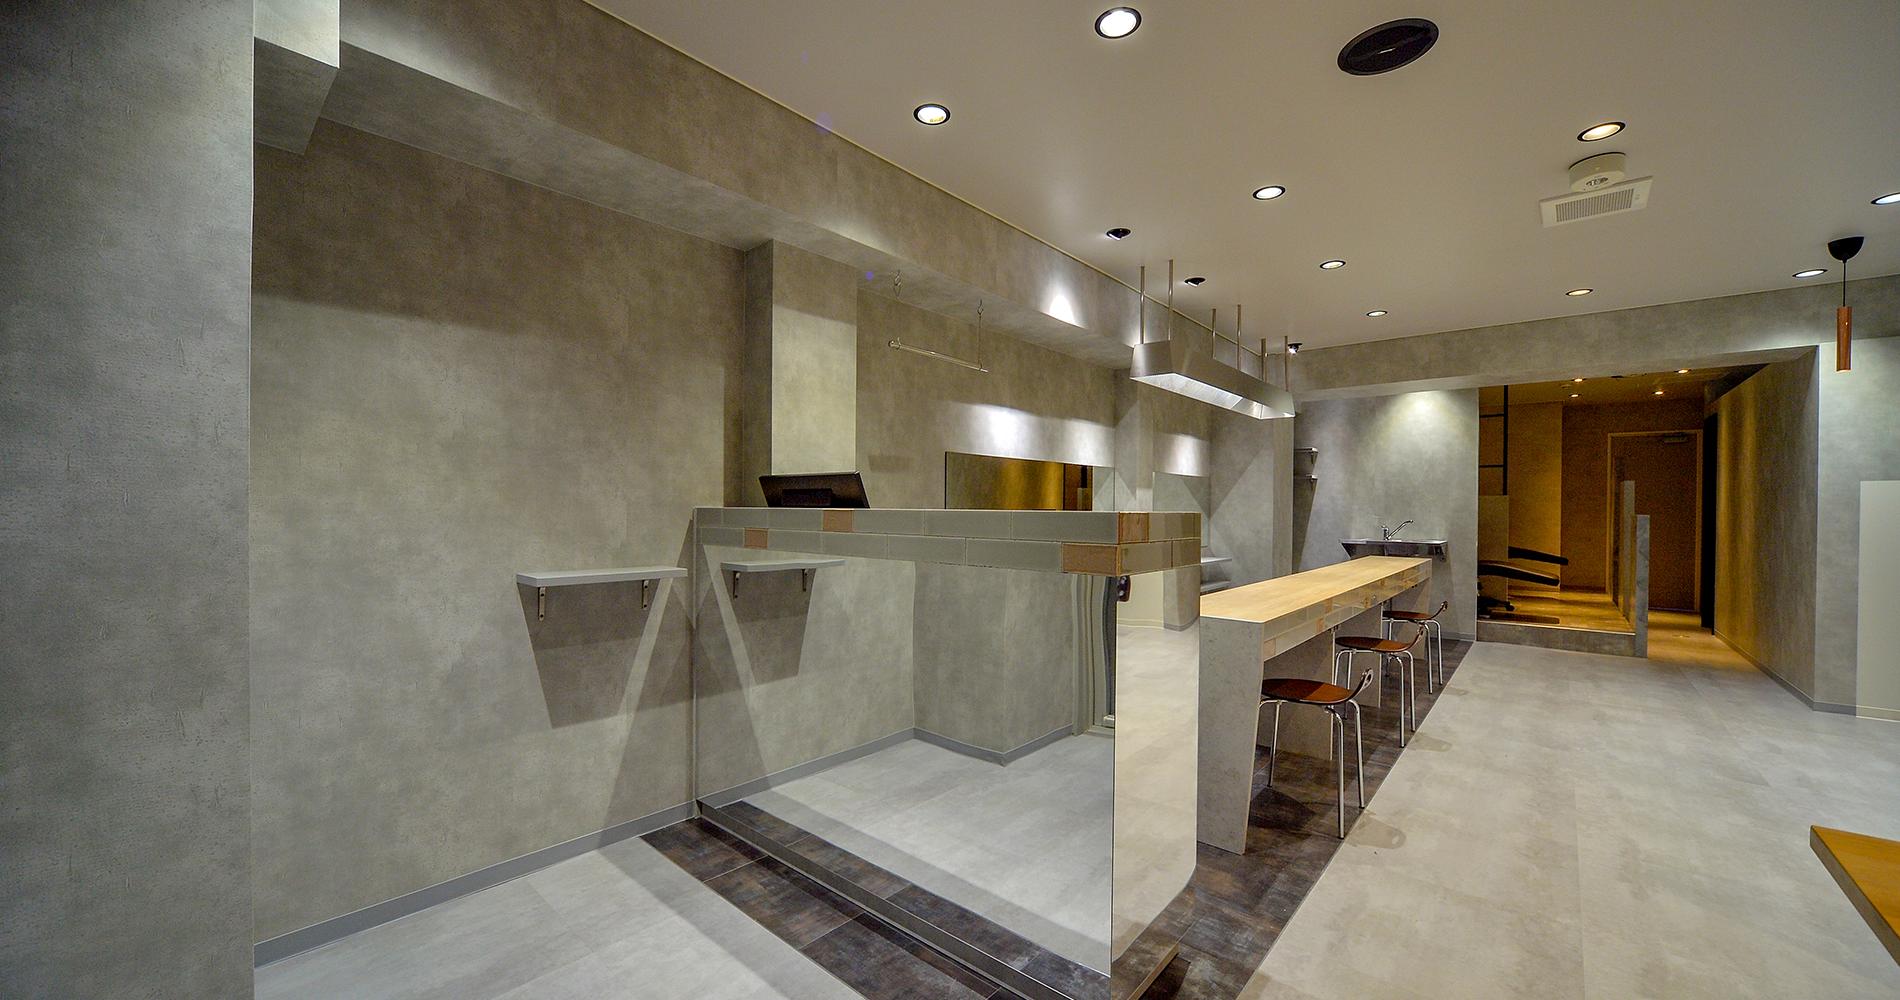 ideal ヘアサロン アイディール 大人のための・月額定額美容室 大阪市西区 靱本町